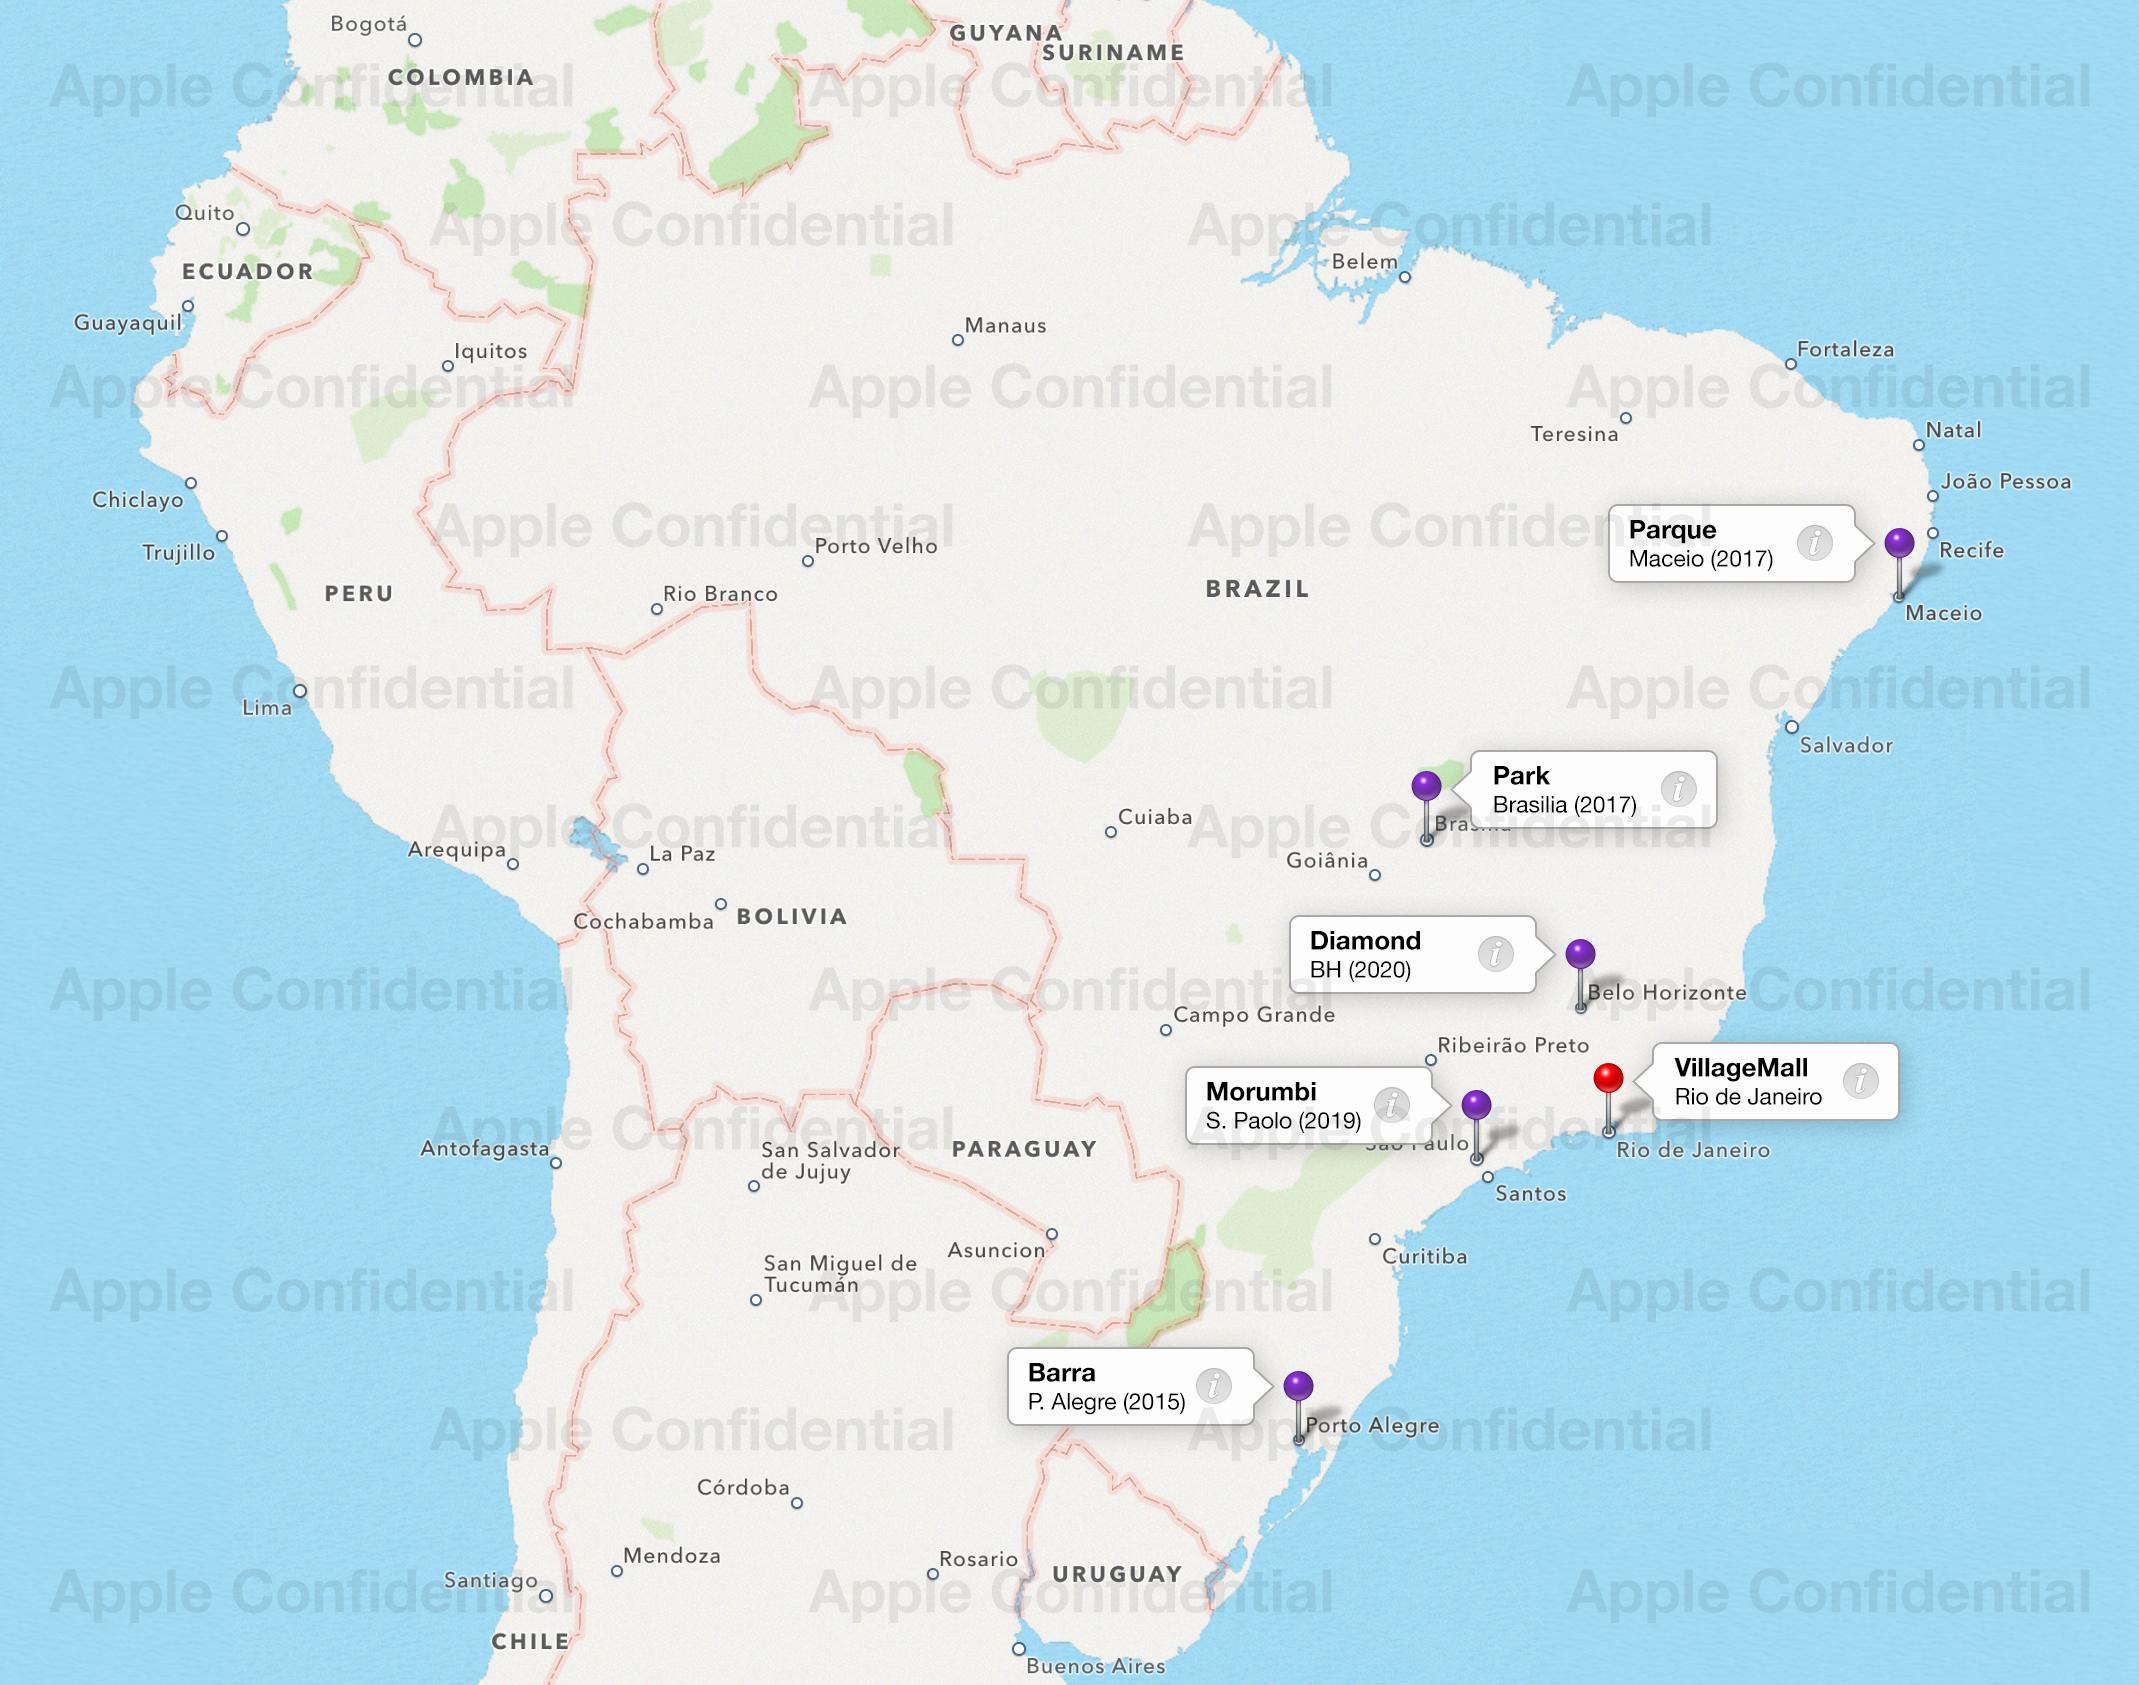 Mapa com futuras Apple Retail Stores no Brasil